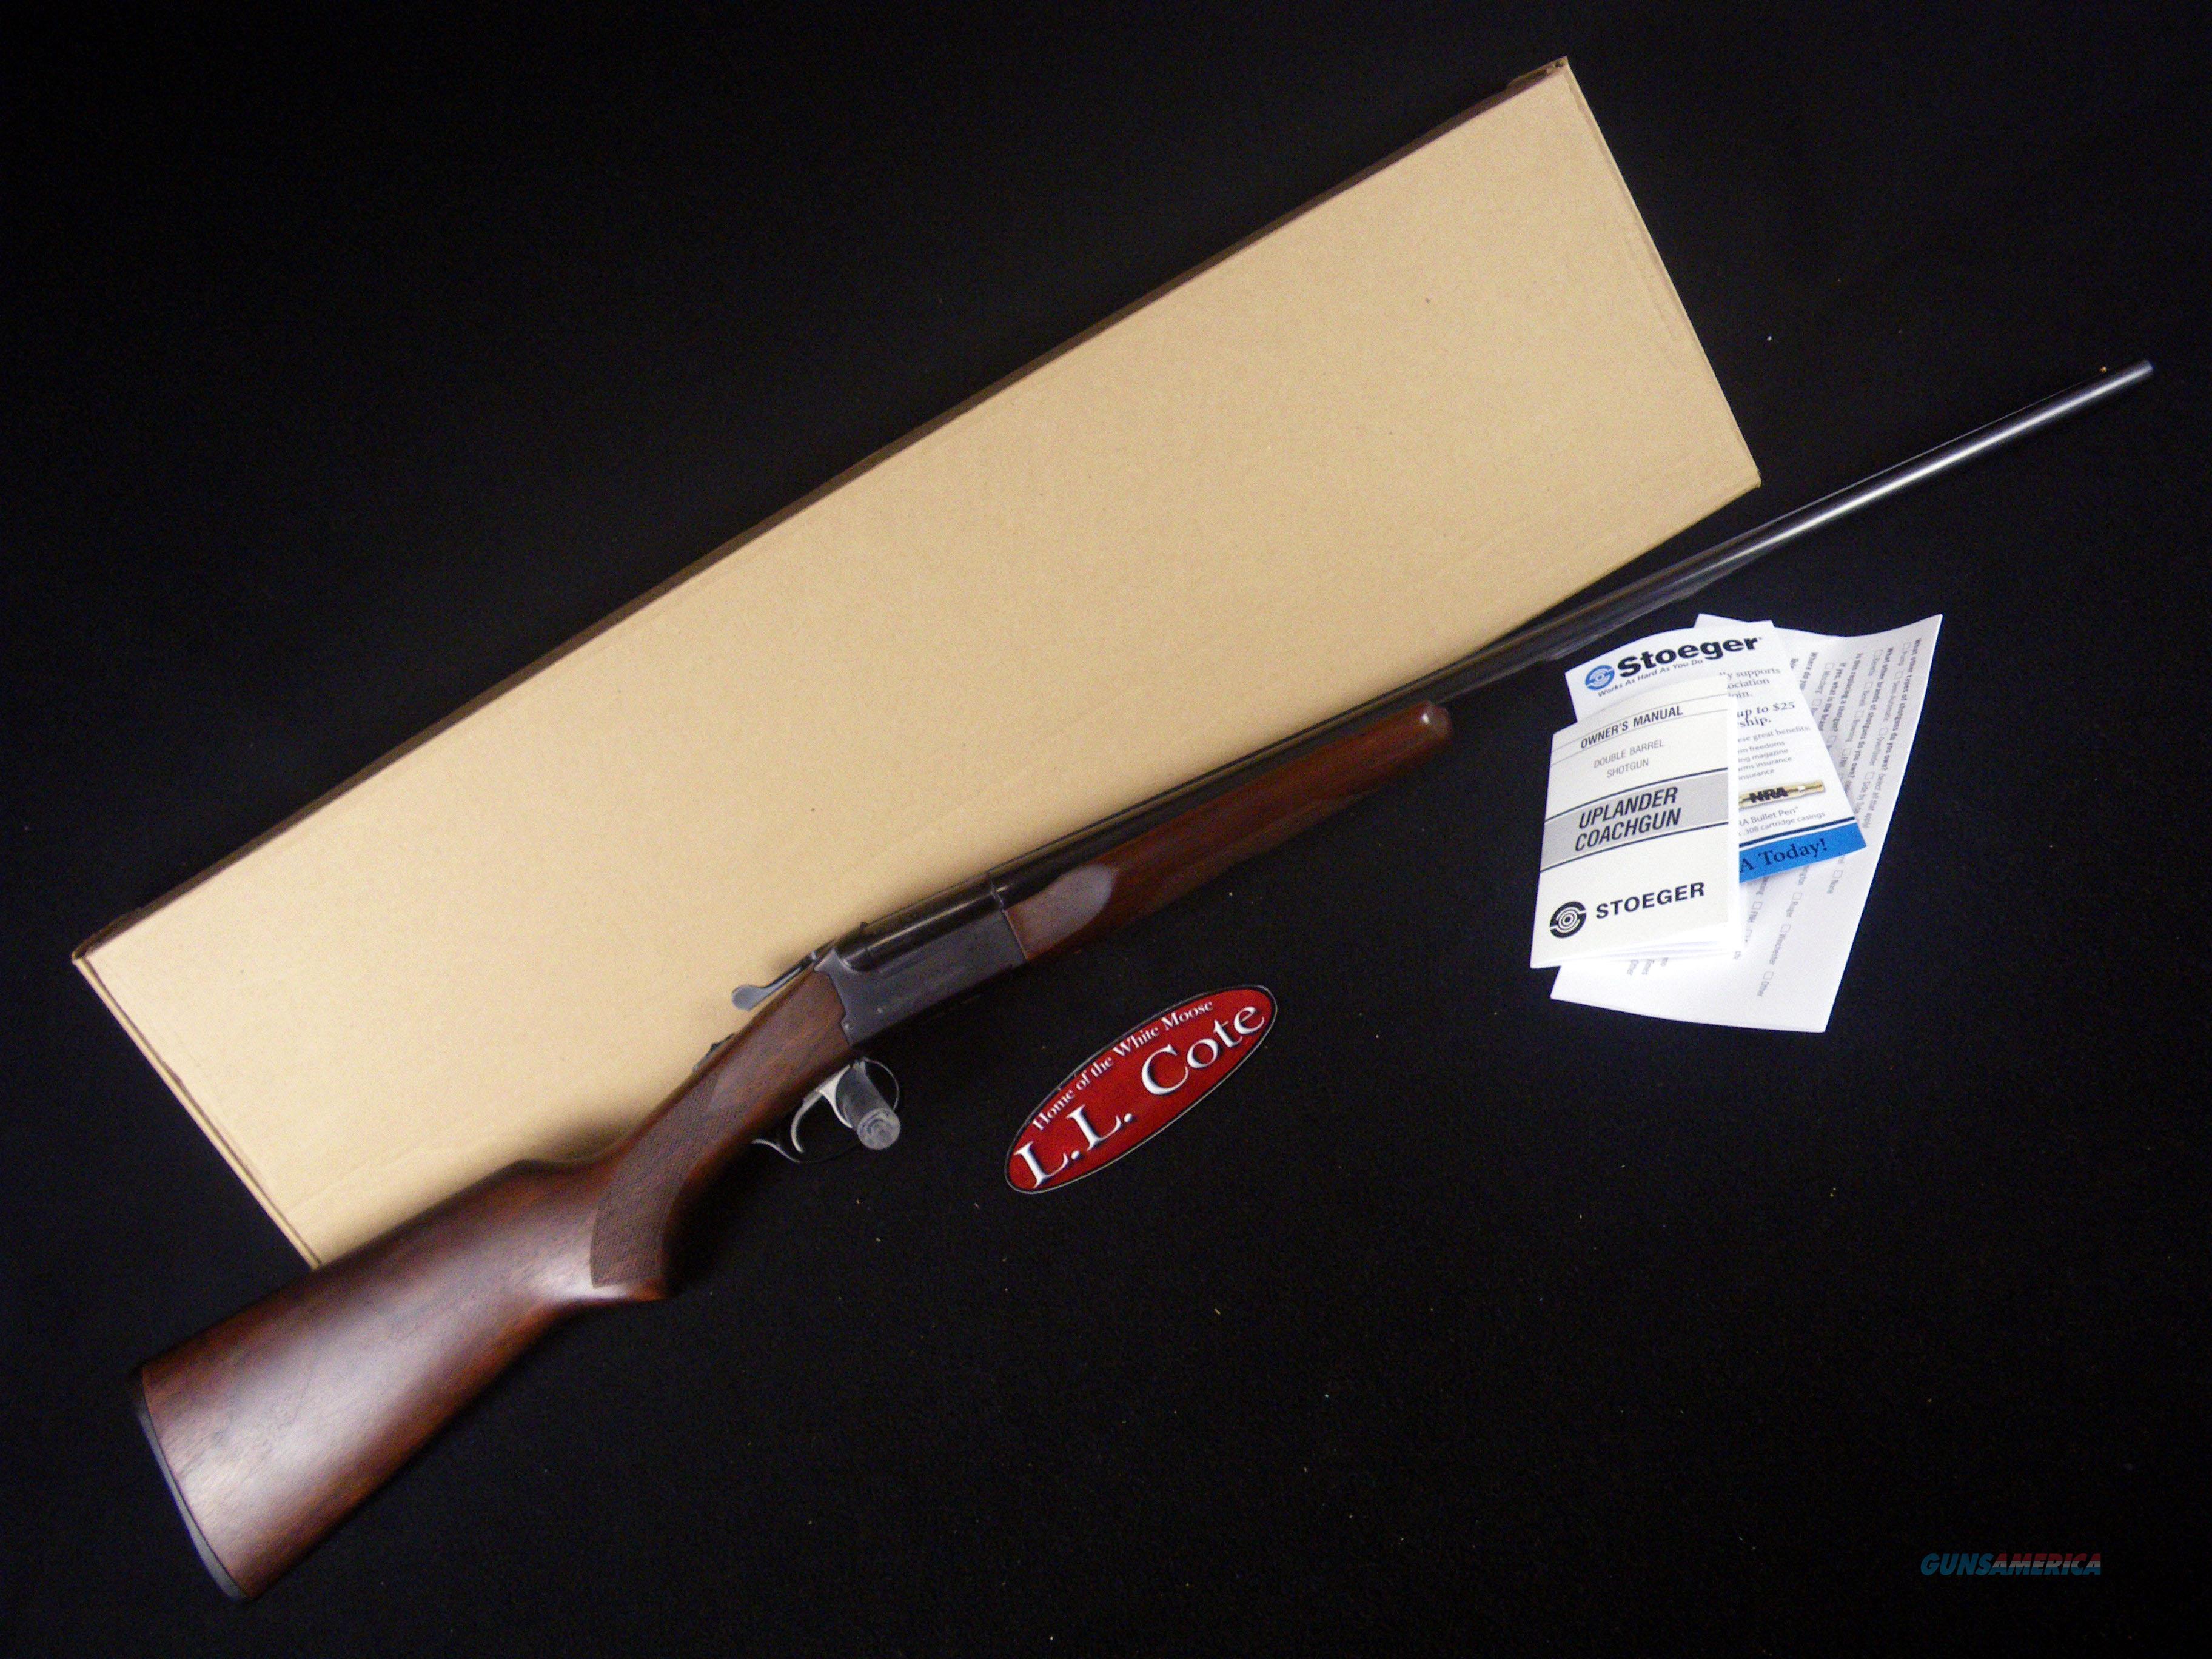 "Stoeger Uplander Field Wood 410ga 26"" NEW 31195  Guns > Shotguns > Stoeger Shotguns"